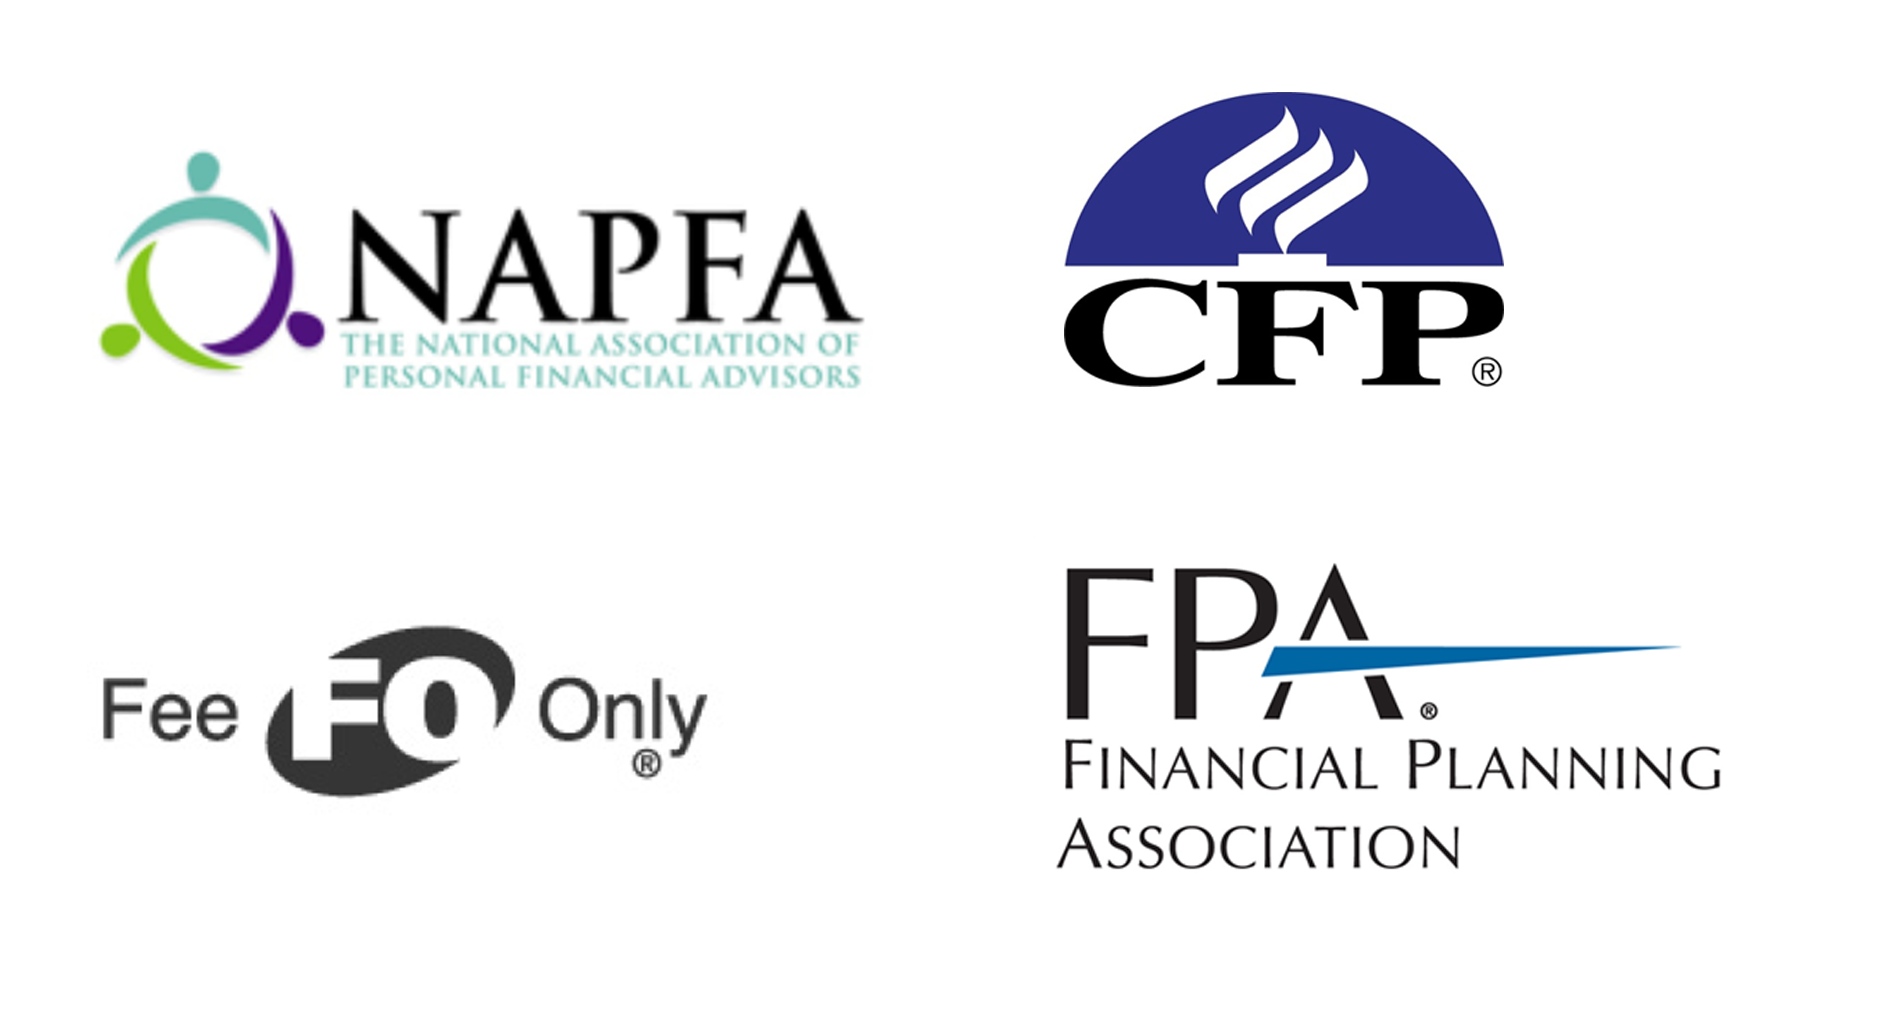 Financial-logos-3.png